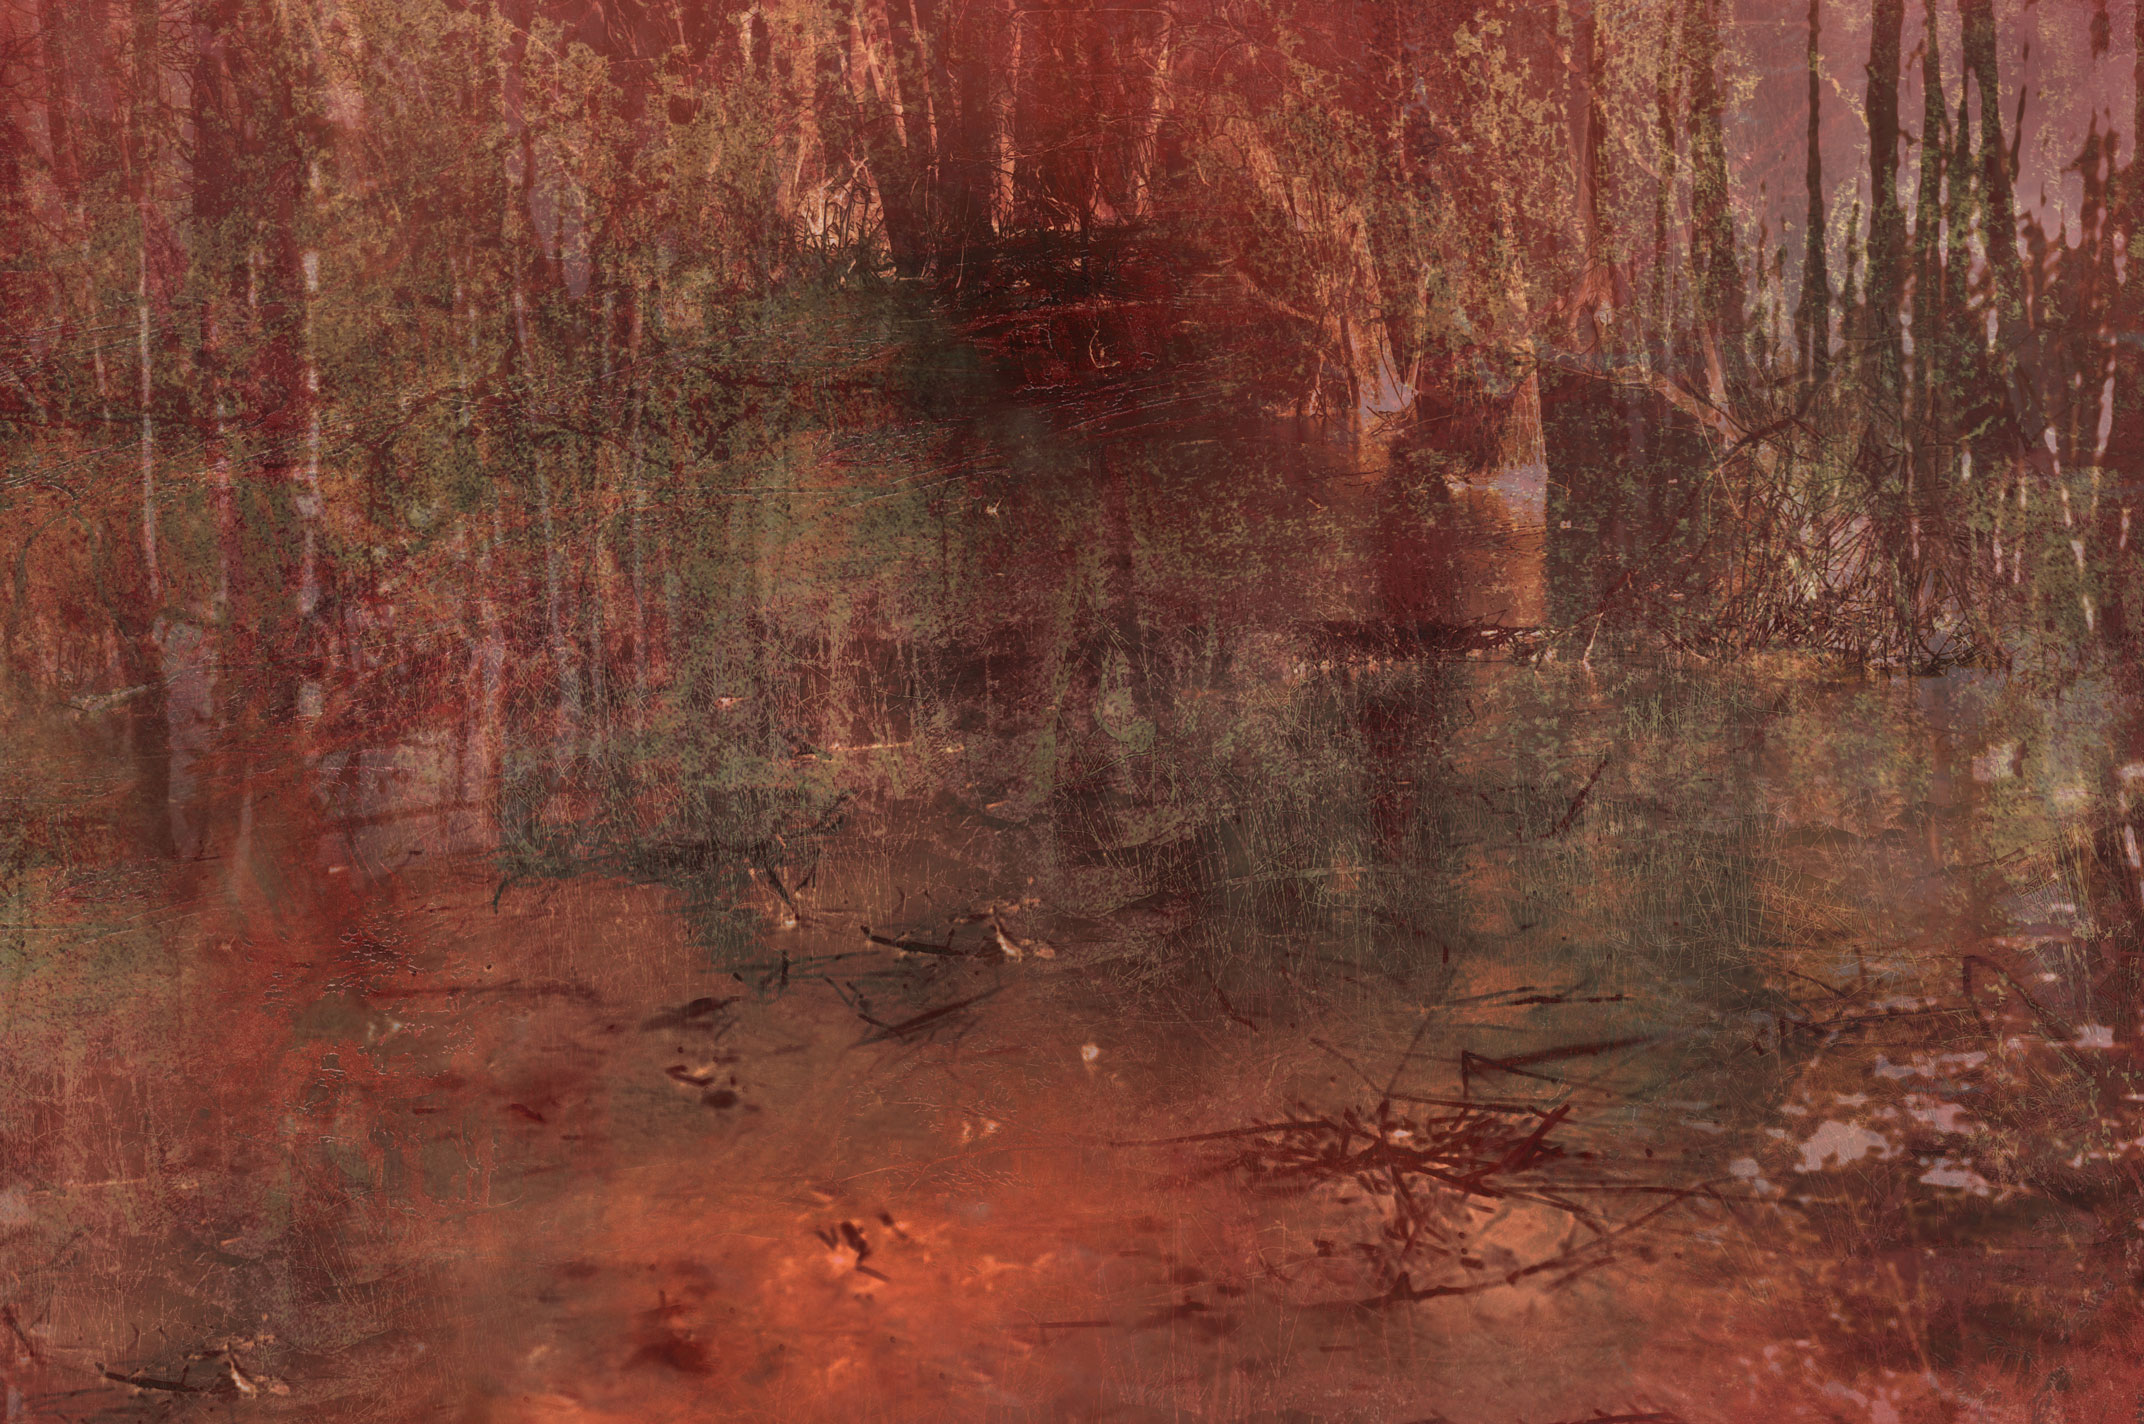 Unearthing #6, 60×90 cm, 2021